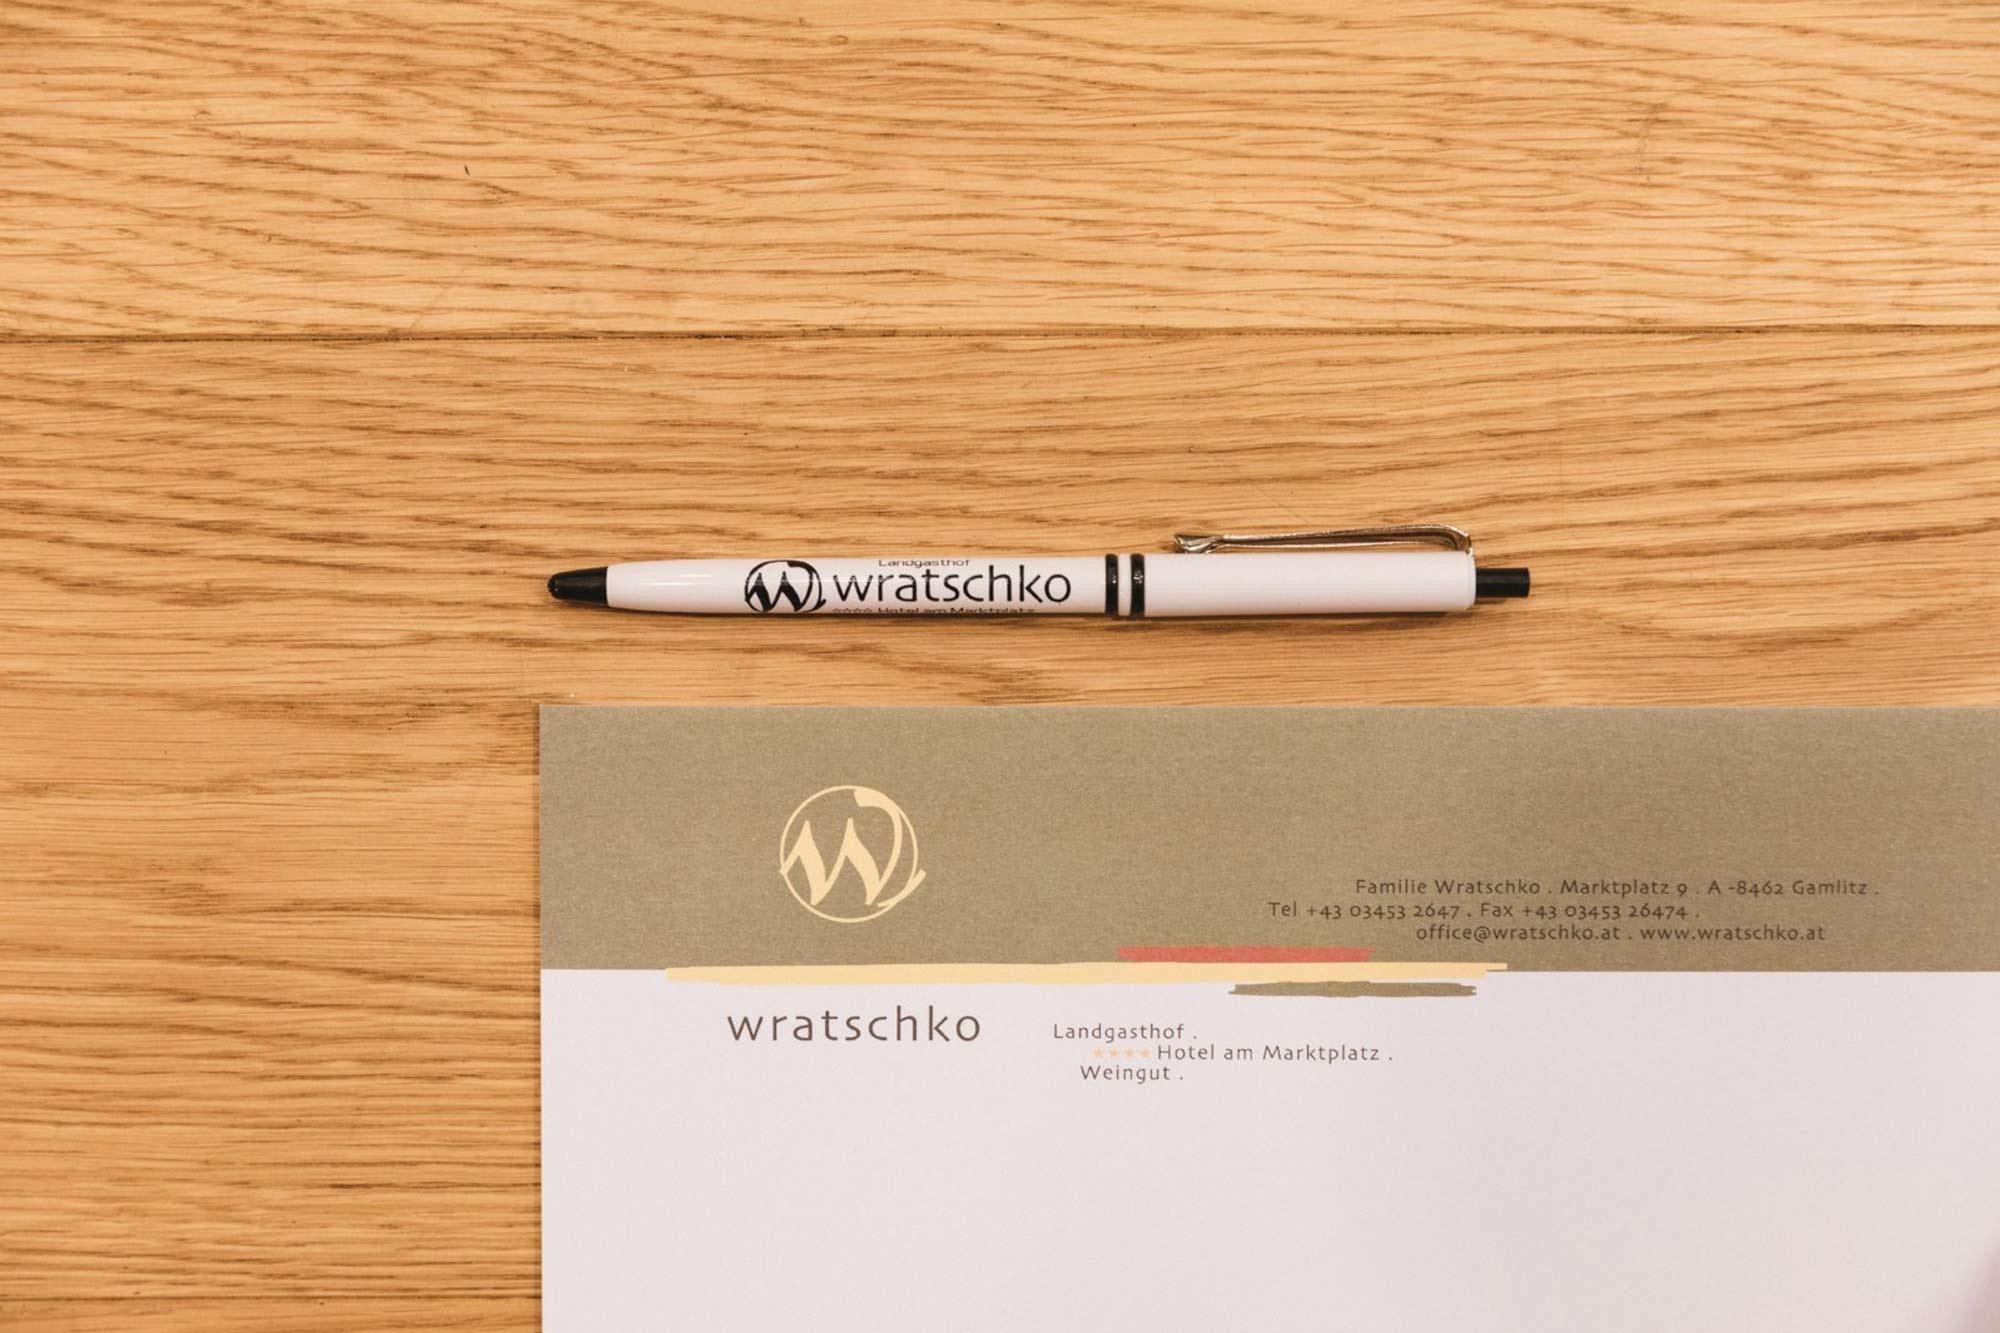 hotel-landgasthof-wratschko-galerie24